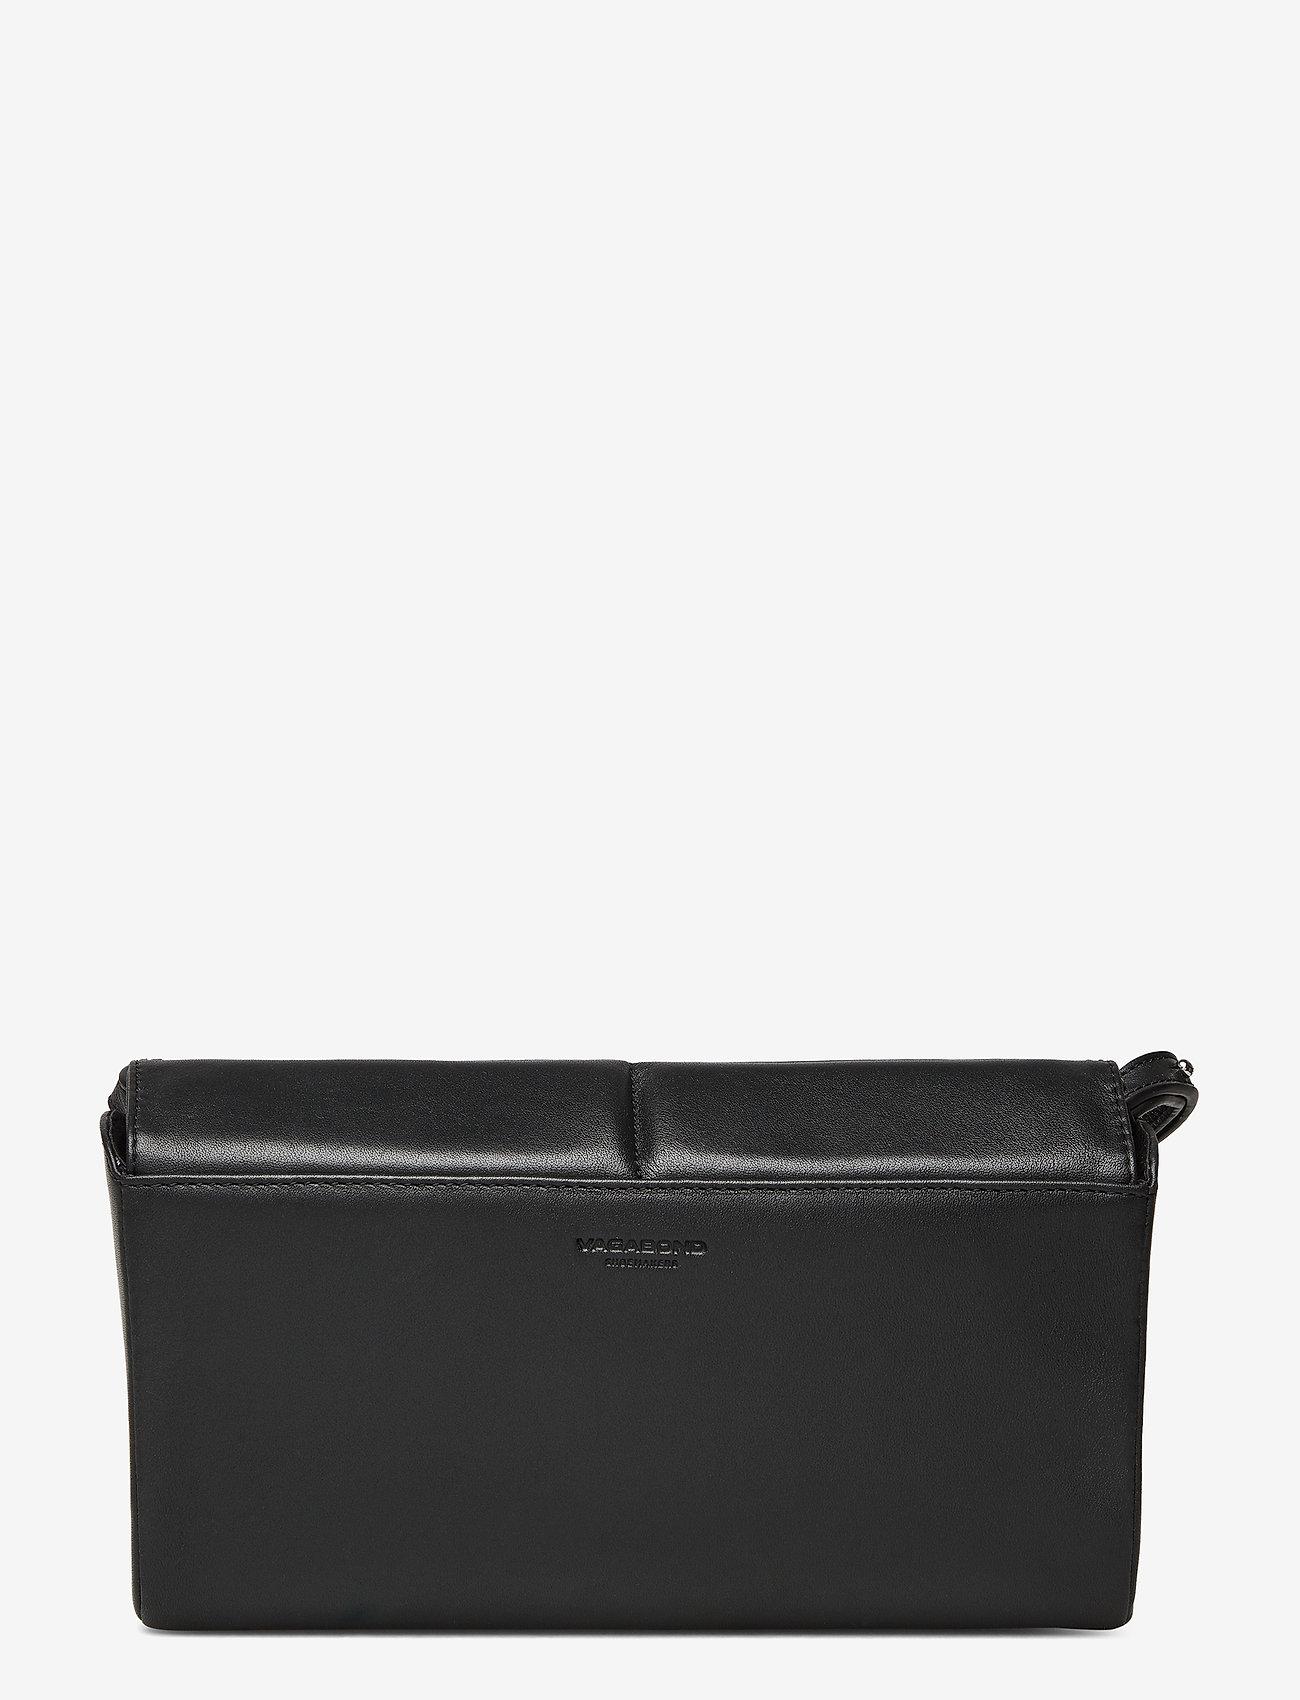 VAGABOND - MALIBU - crossbody bags - black - 1